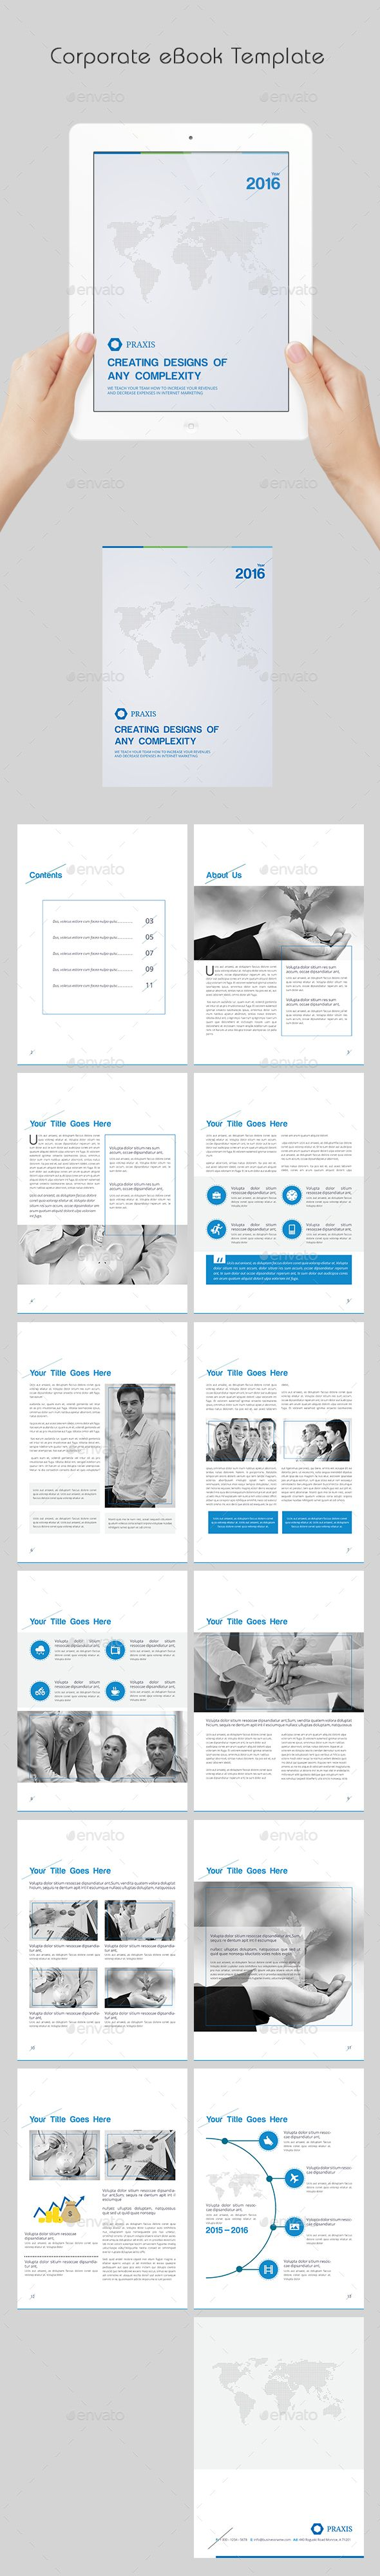 Corporate ebook template template book layouts and business flyers corporate ebook template indesign indd design download httpgraphicriveritemcorporate ebook template13961531refksioks fandeluxe Gallery